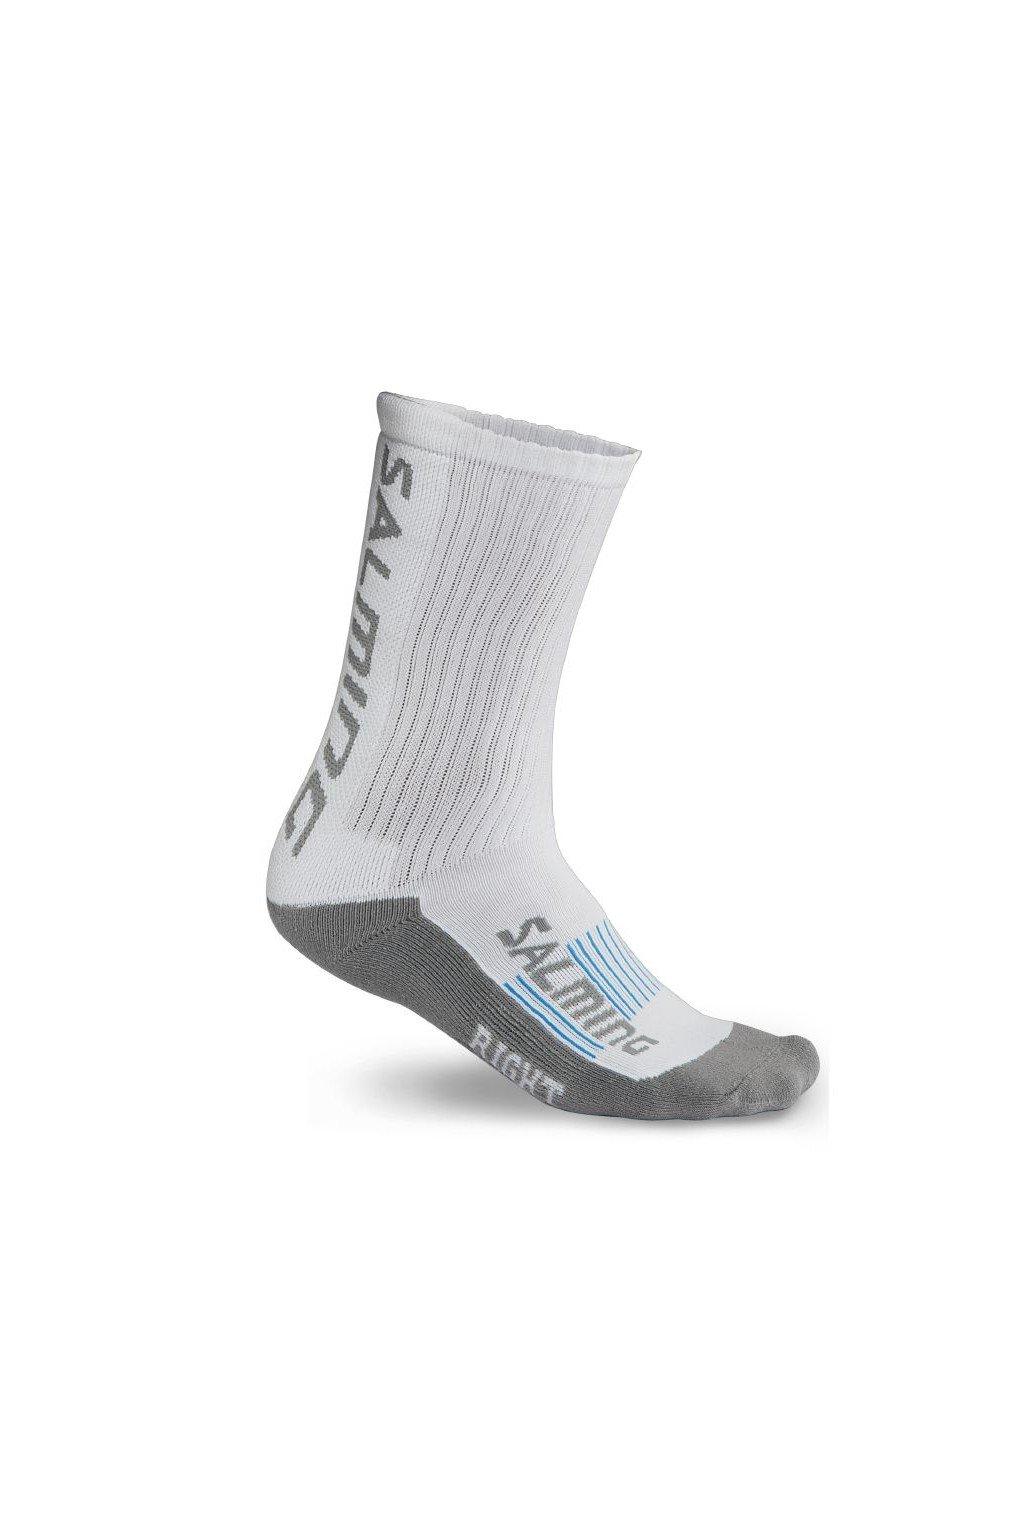 salming advanced indoor sock white 46 49